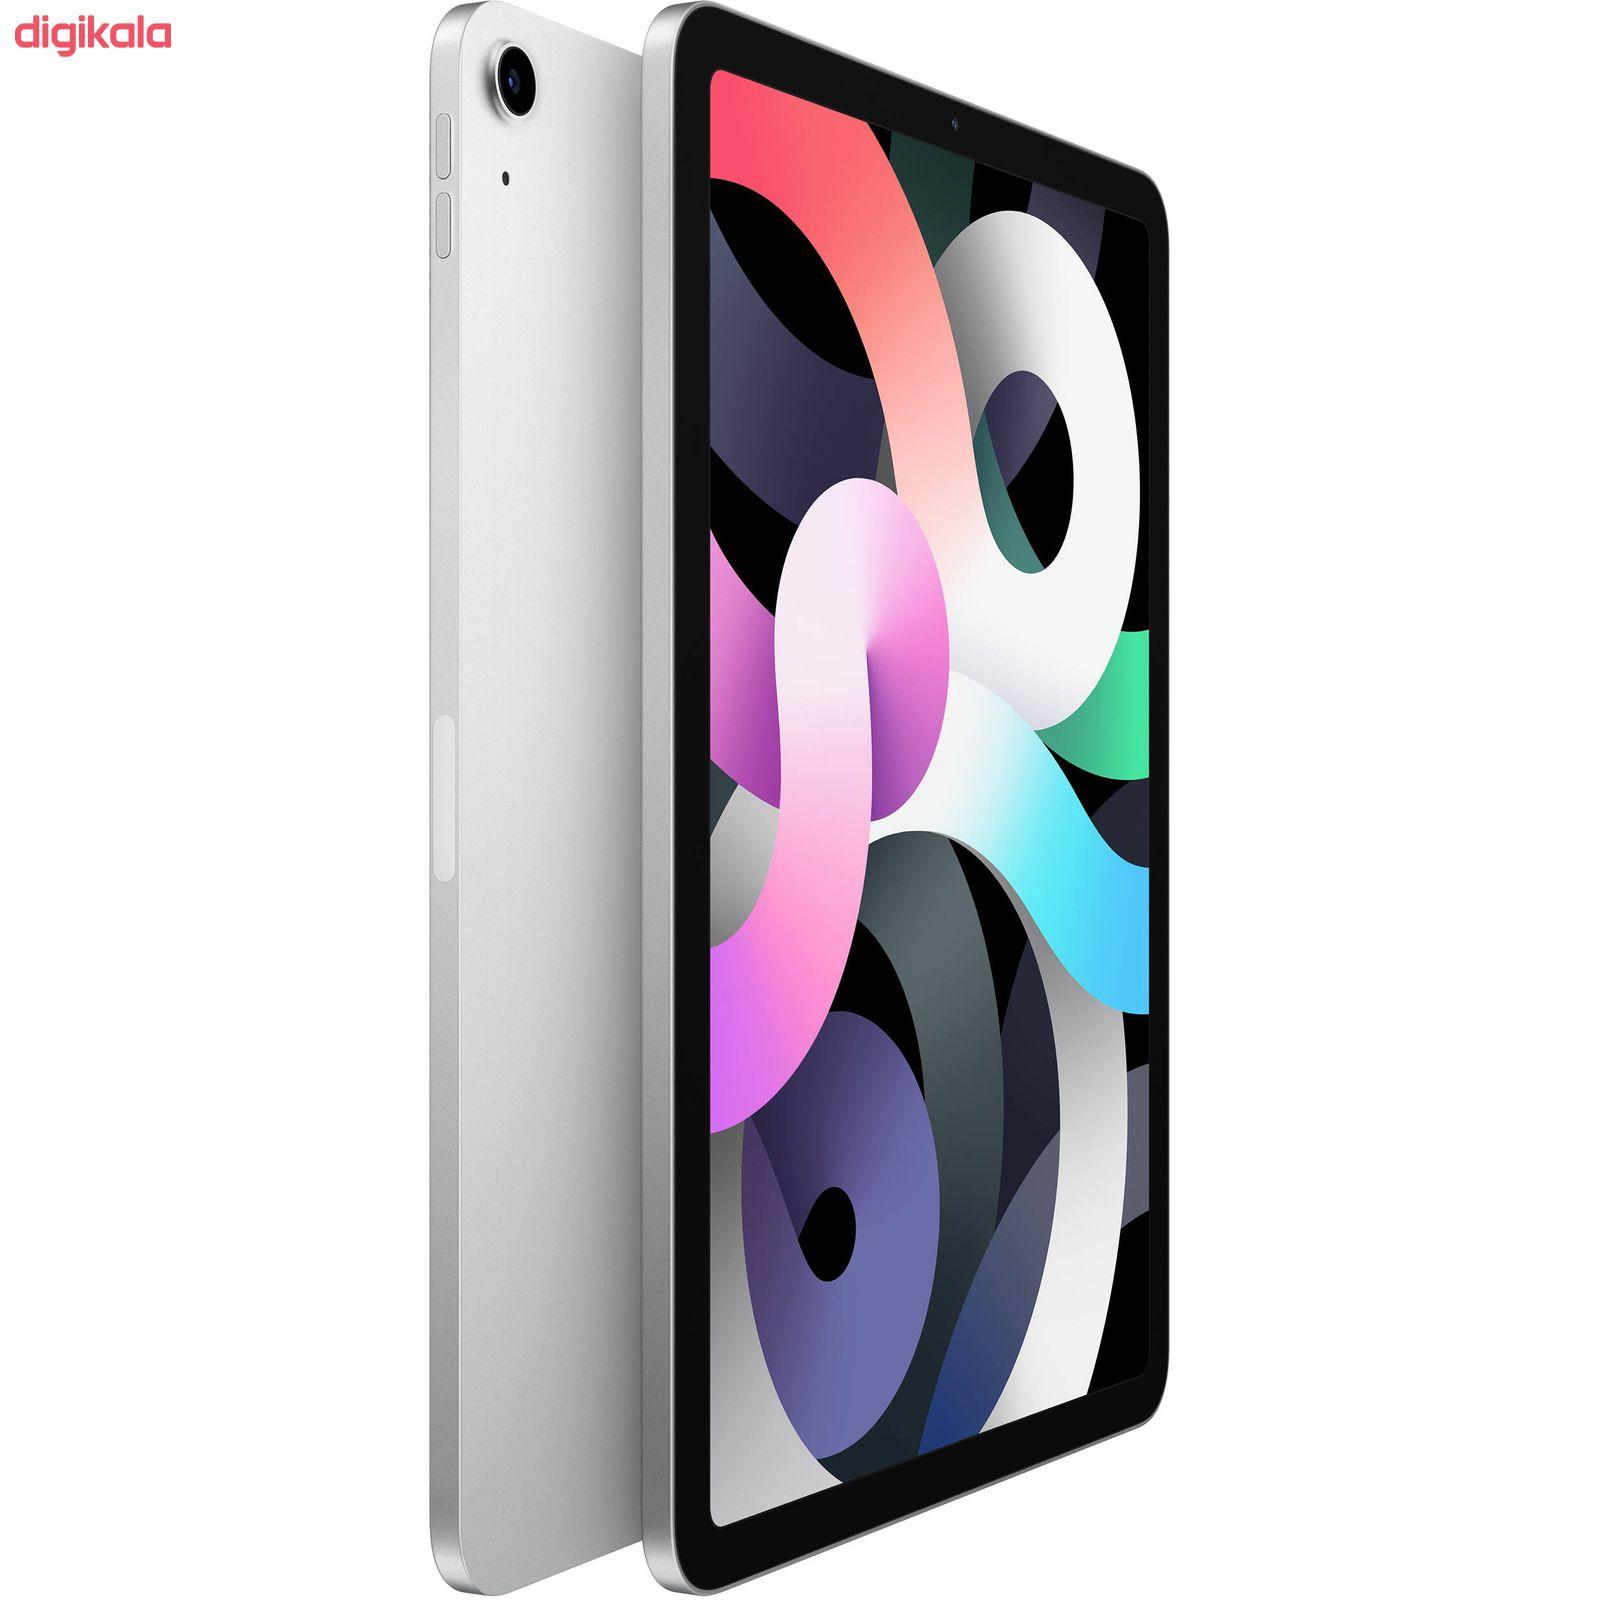 تبلت اپل مدل iPad Air 10.9 inch 2020 WiFi ظرفیت 64 گیگابایت  main 1 14